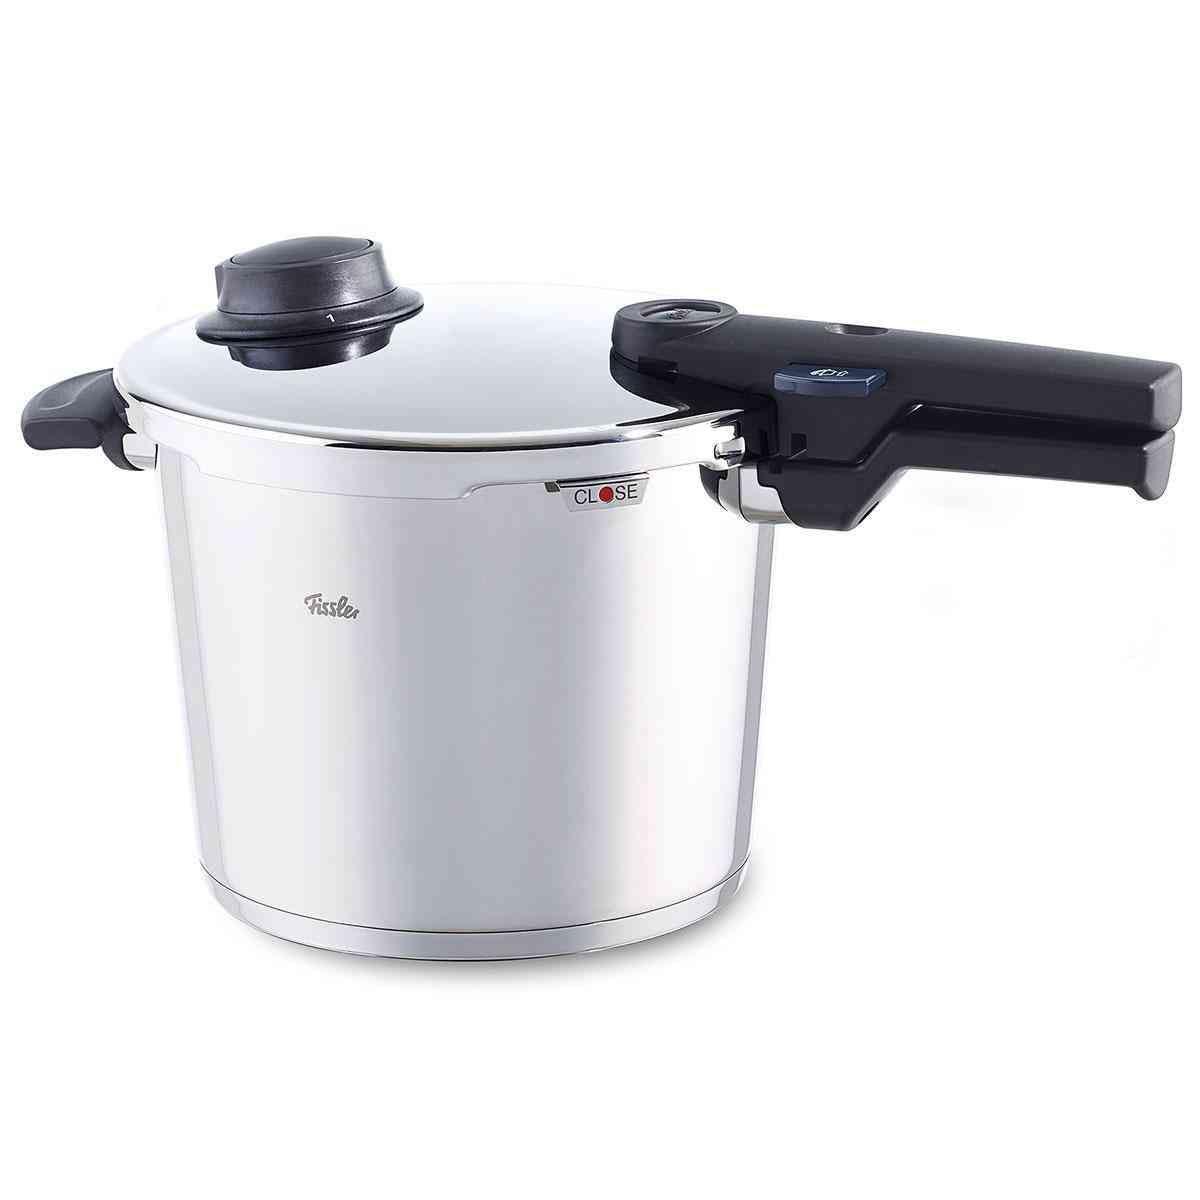 Open Box - vitavit® comfort Pressure Cooker, 4.8 Quart